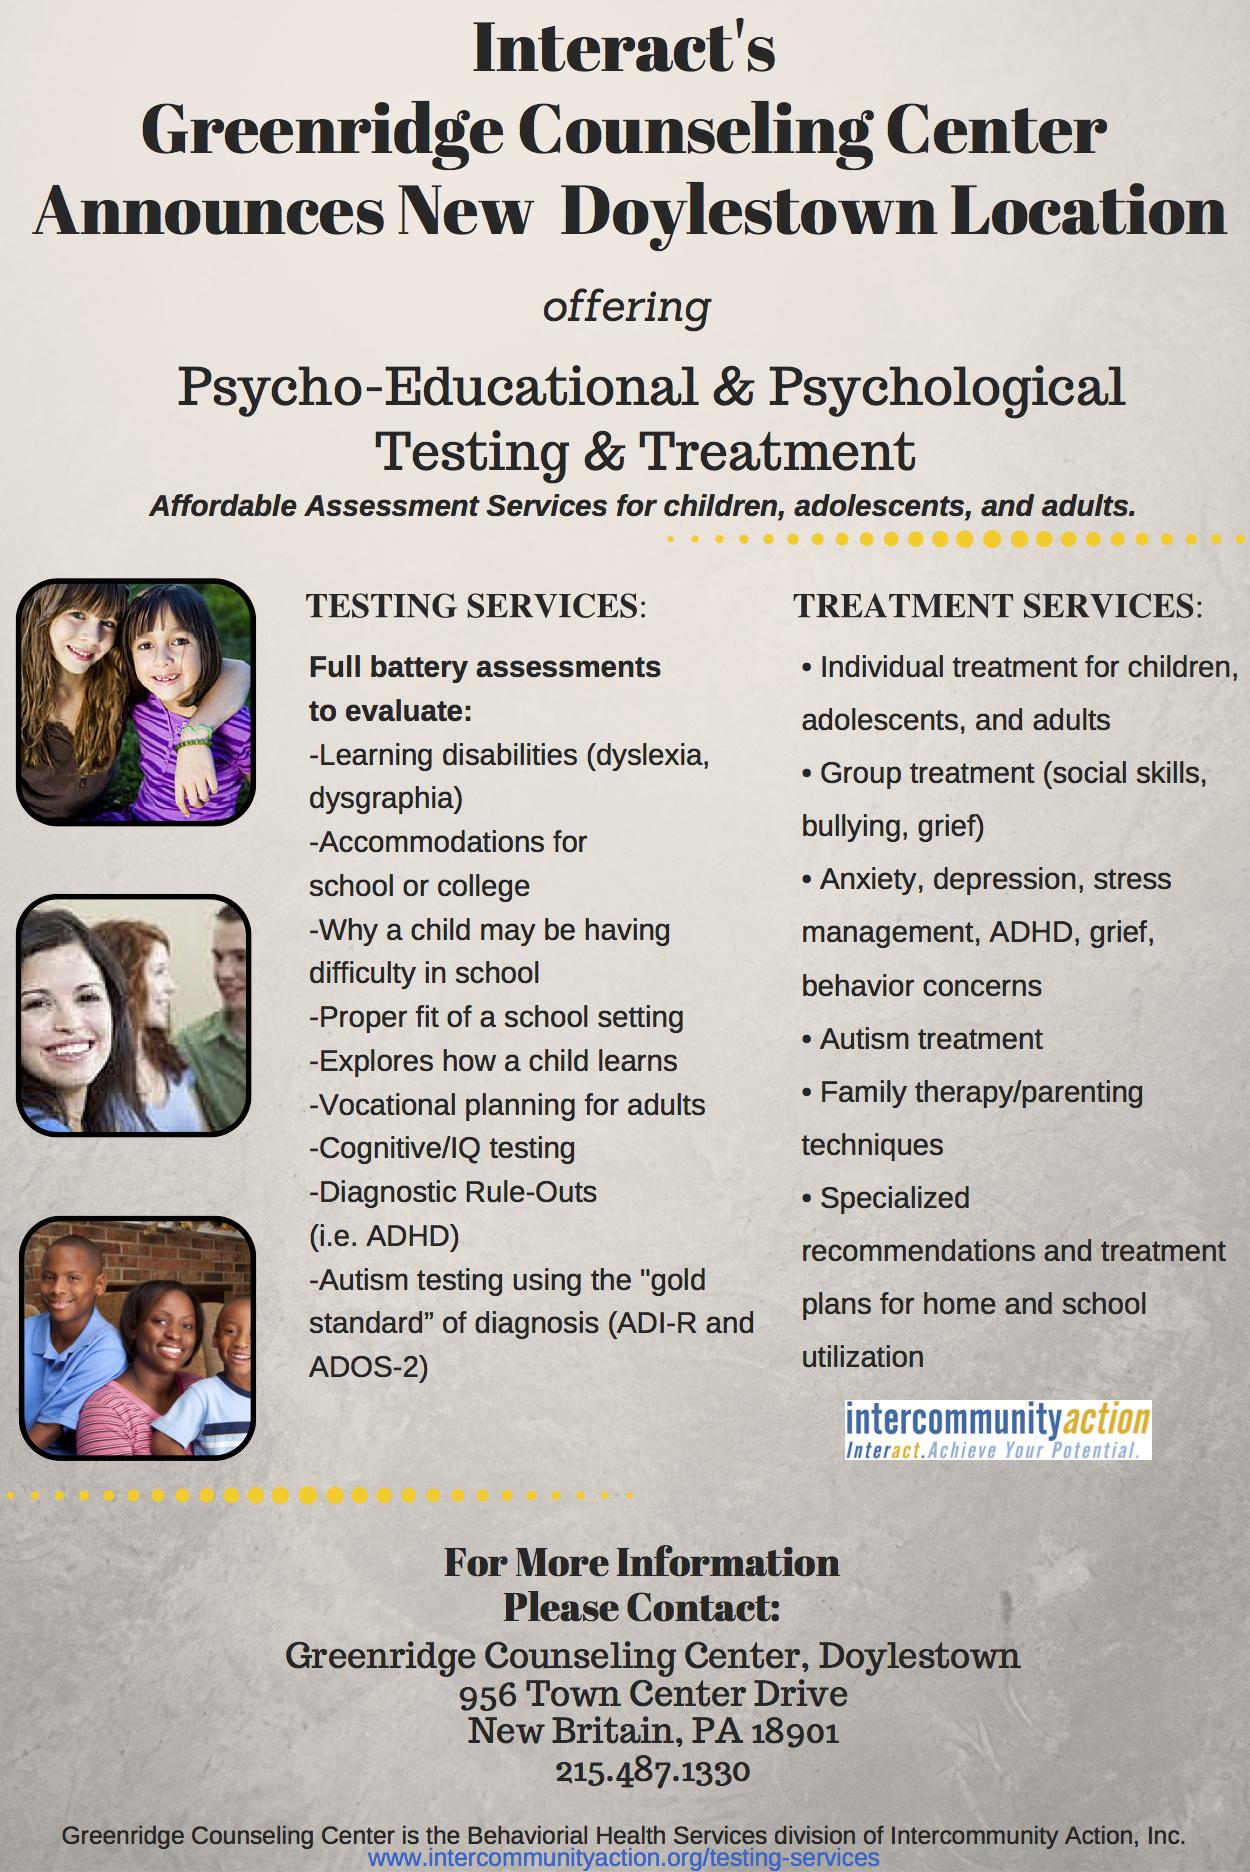 Greenridge Counseling